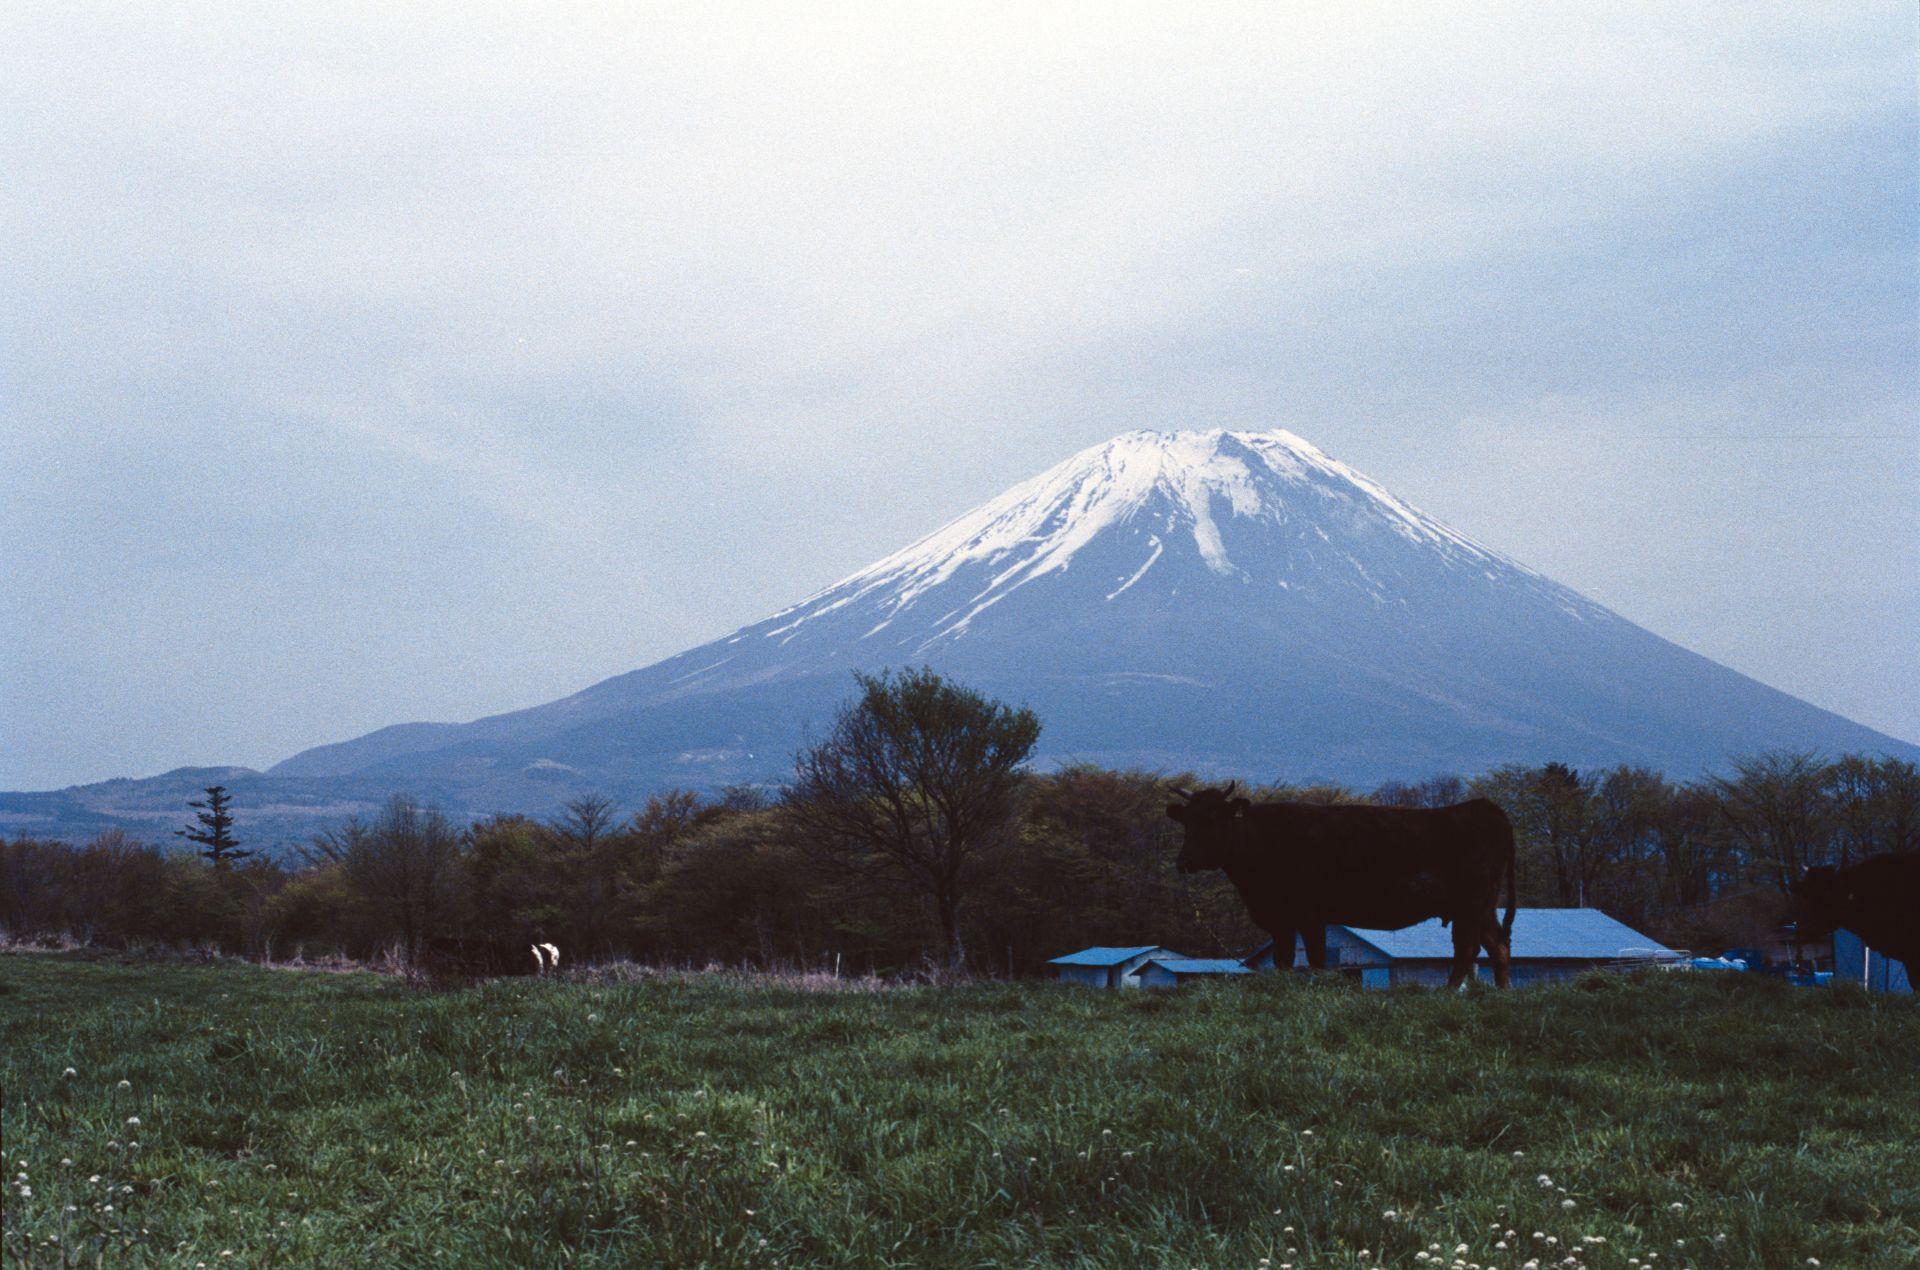 f:id:yasuo_ssi:20201015232717j:plain